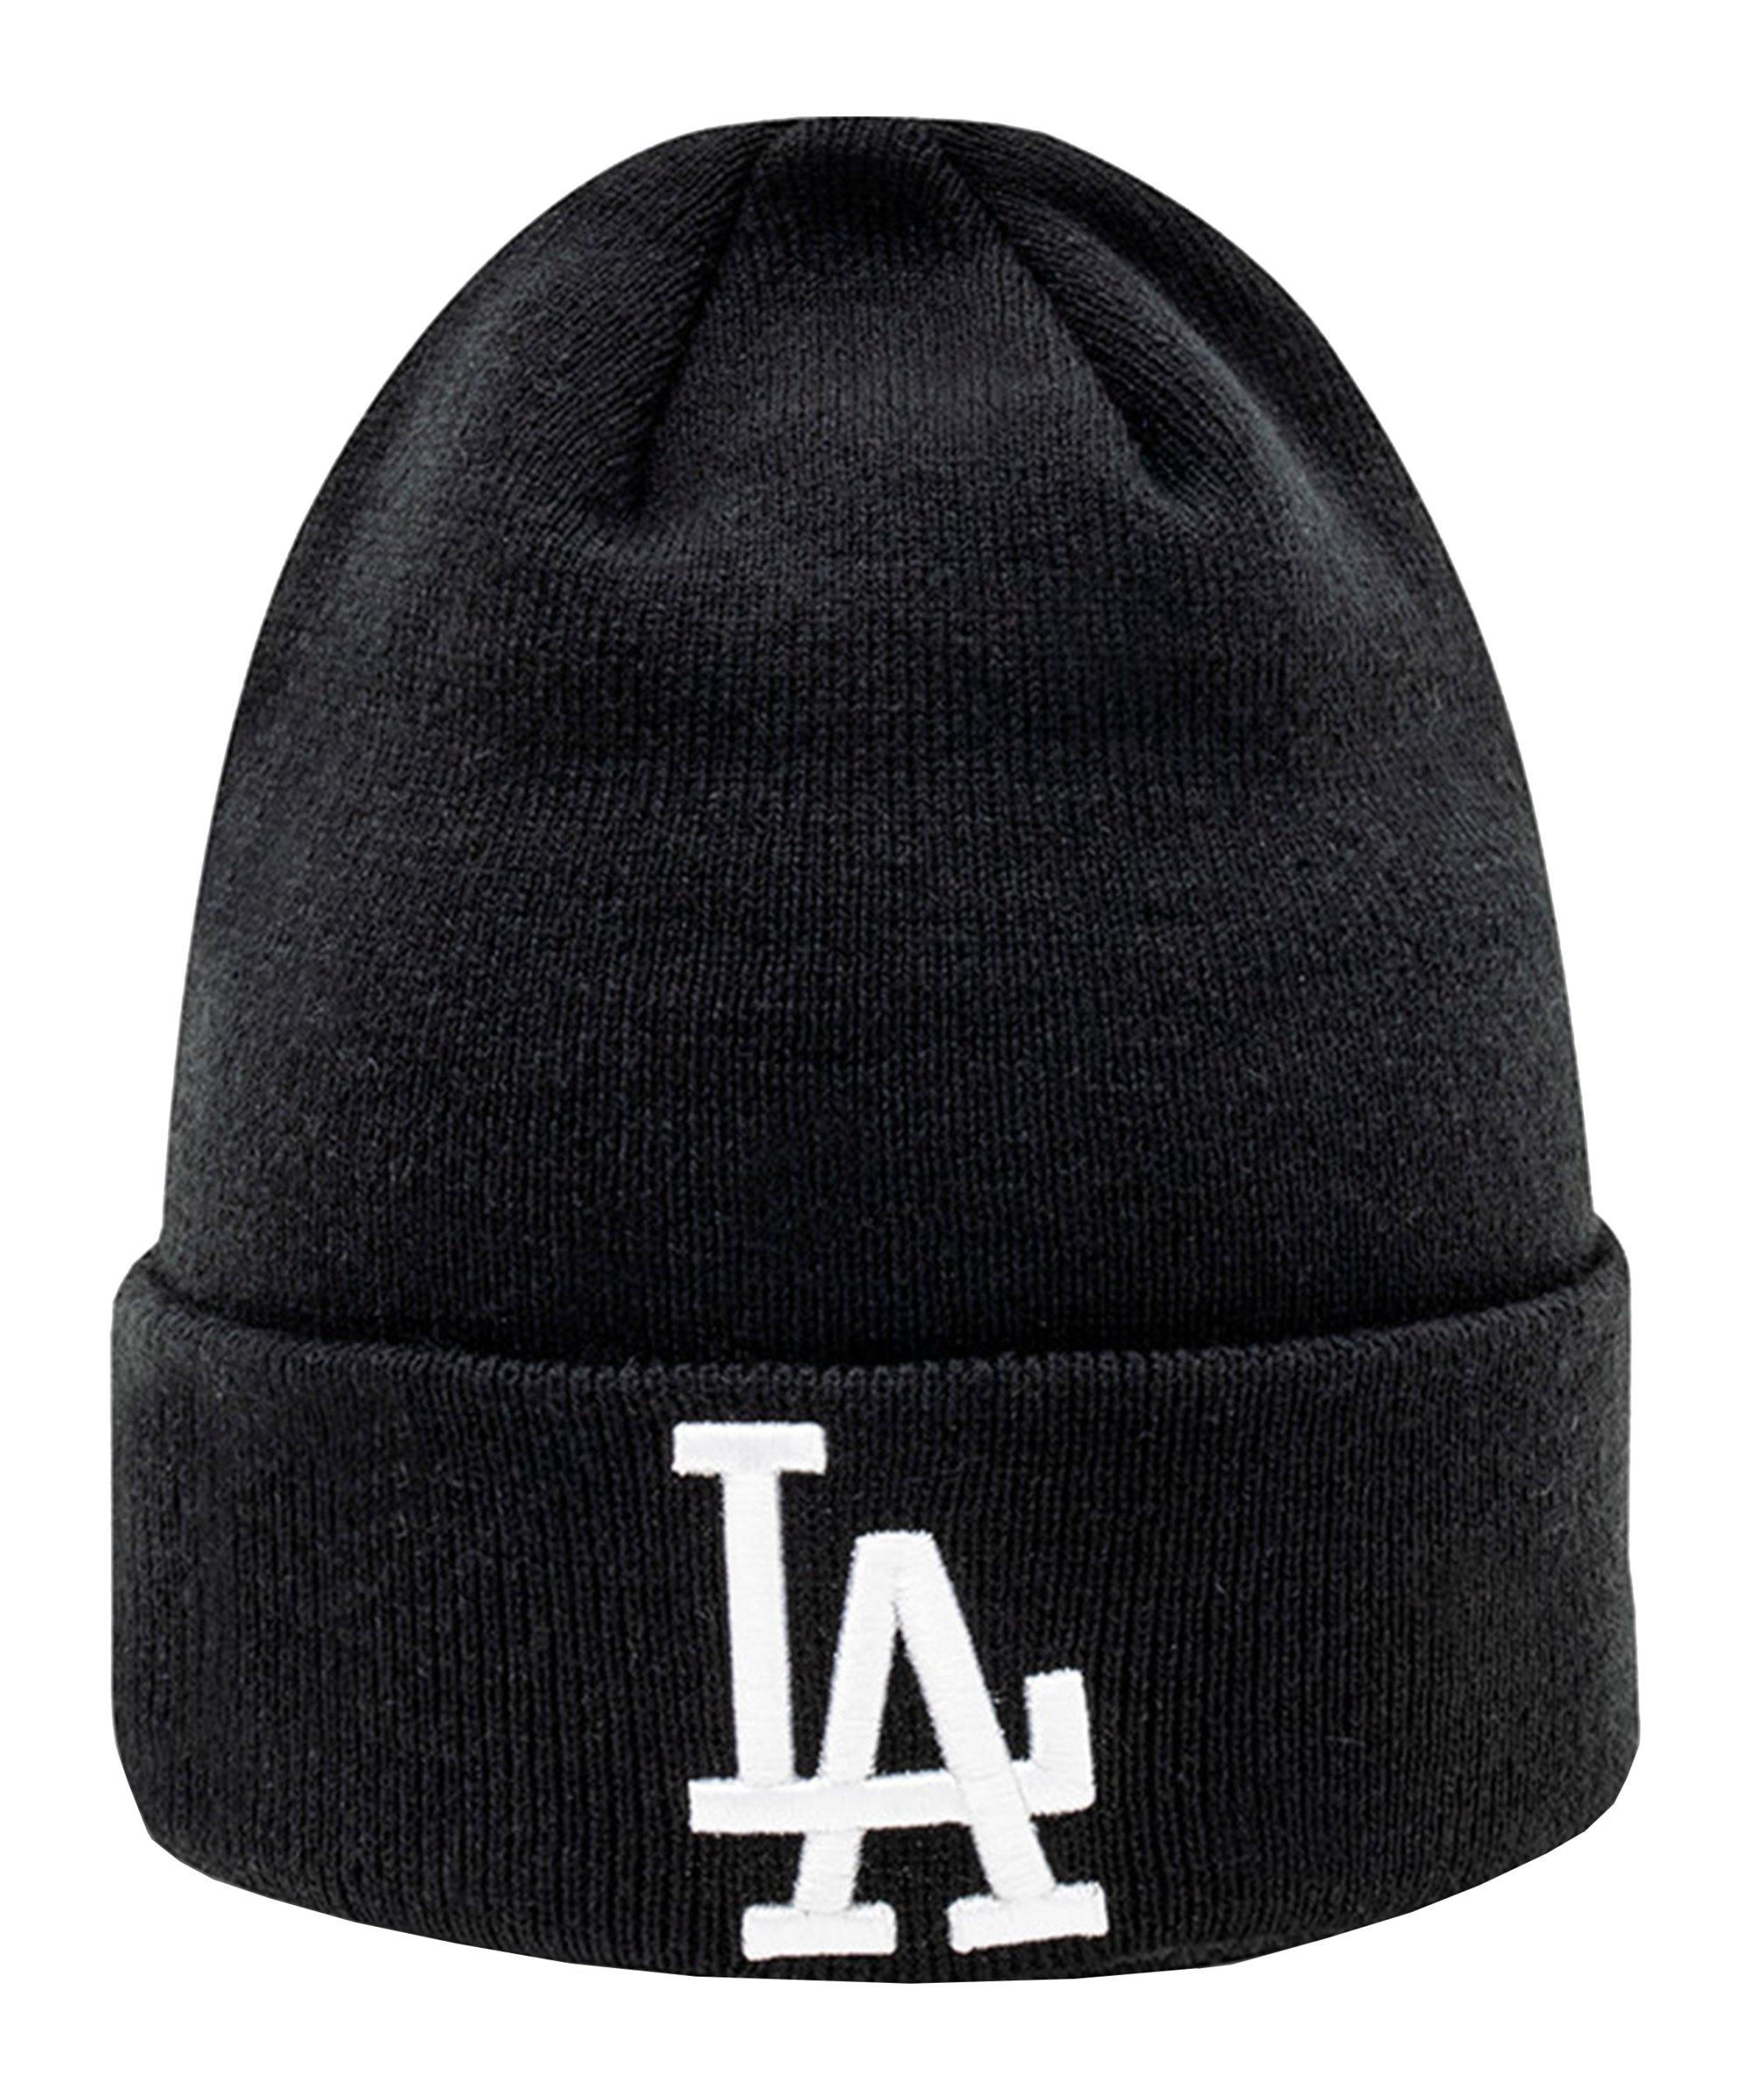 New Era LA Dodgers Cuff Beanie Schwarz FBLKWHI - schwarz